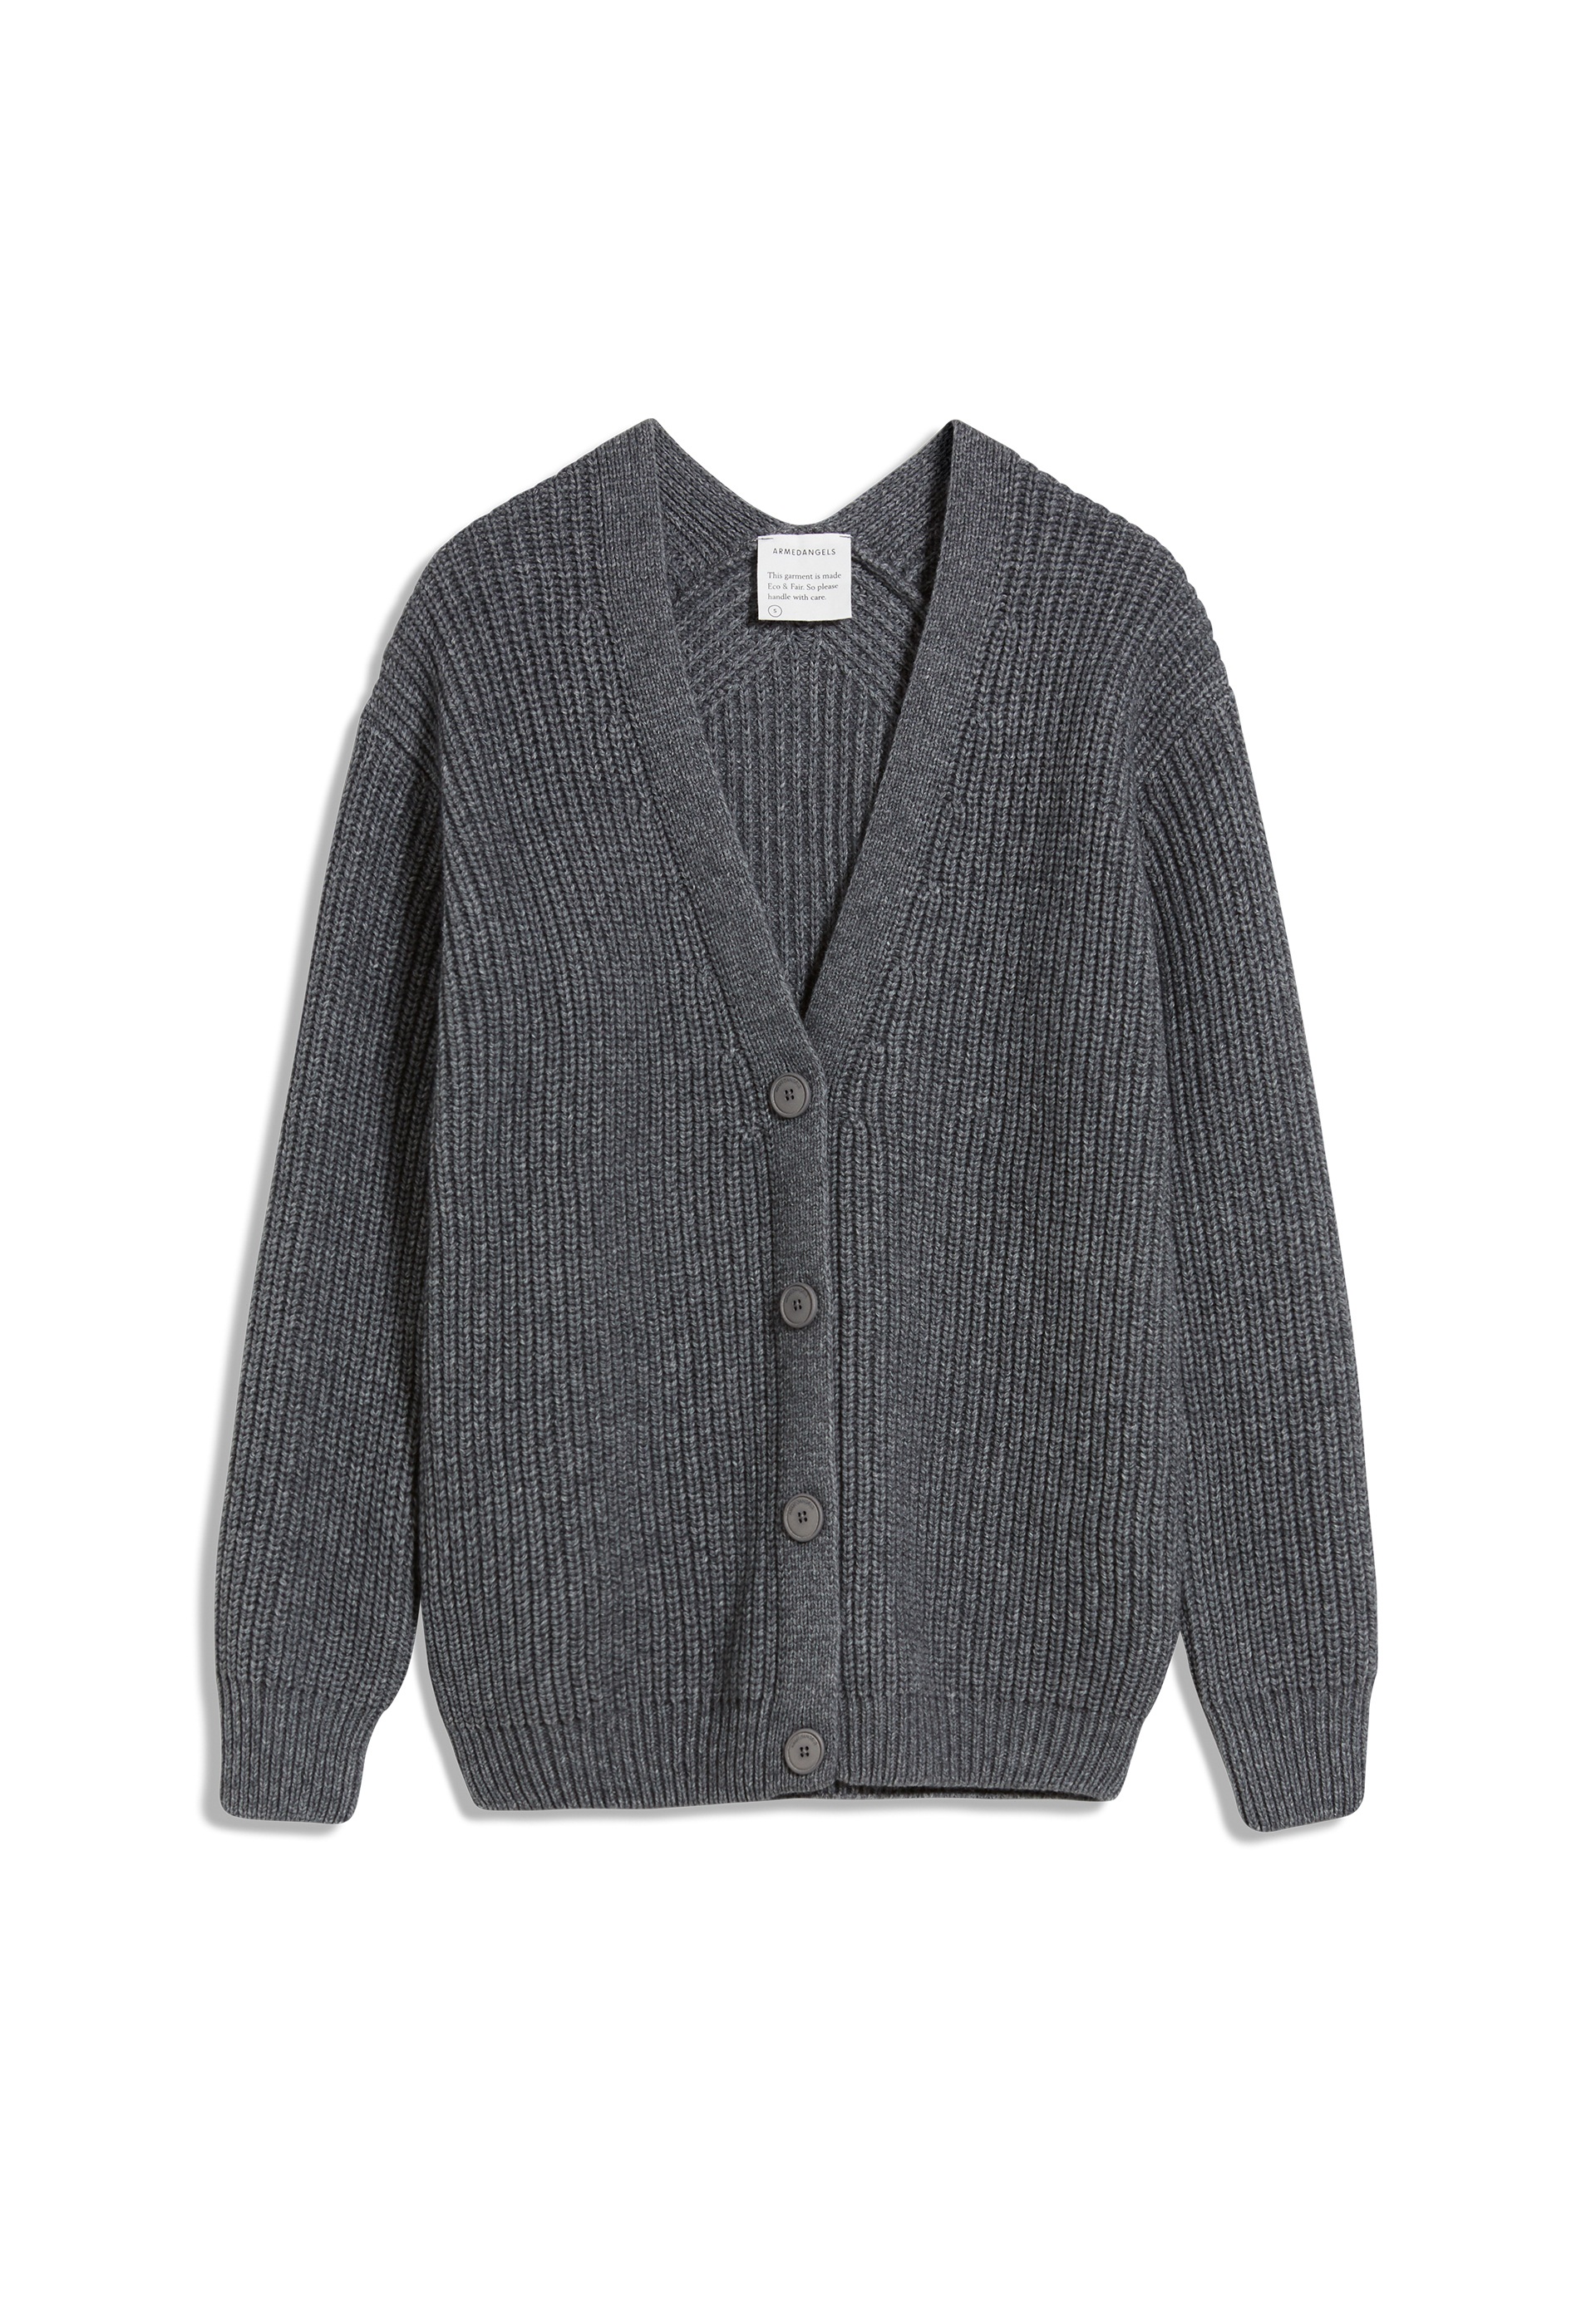 MAIYAA Cardigan made of Organic Wool Mix